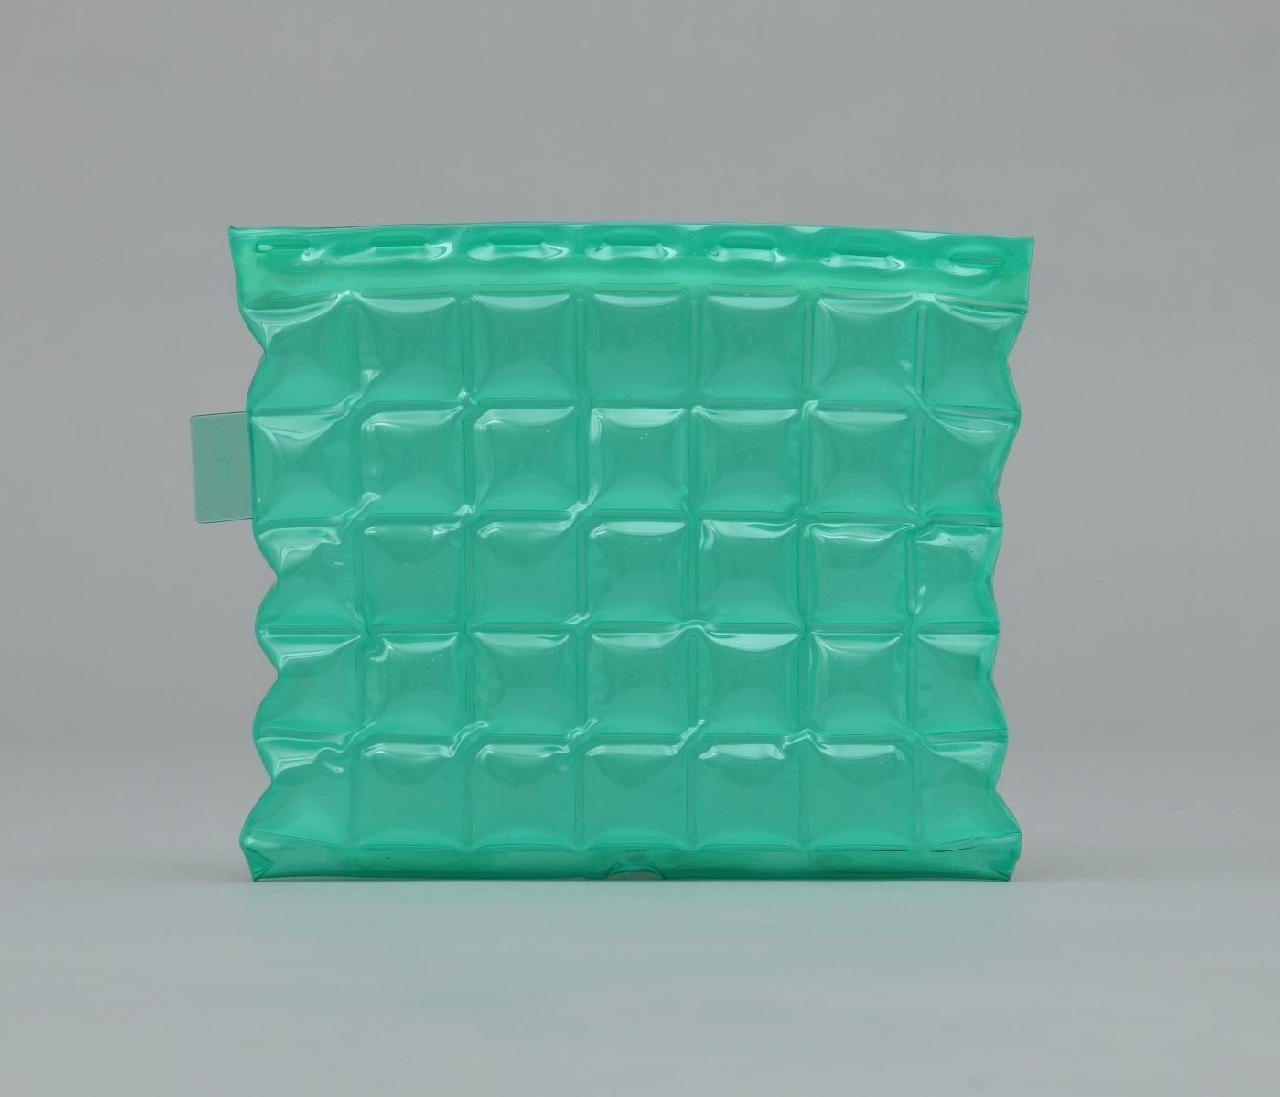 PC CELL mini 色透明グリーン